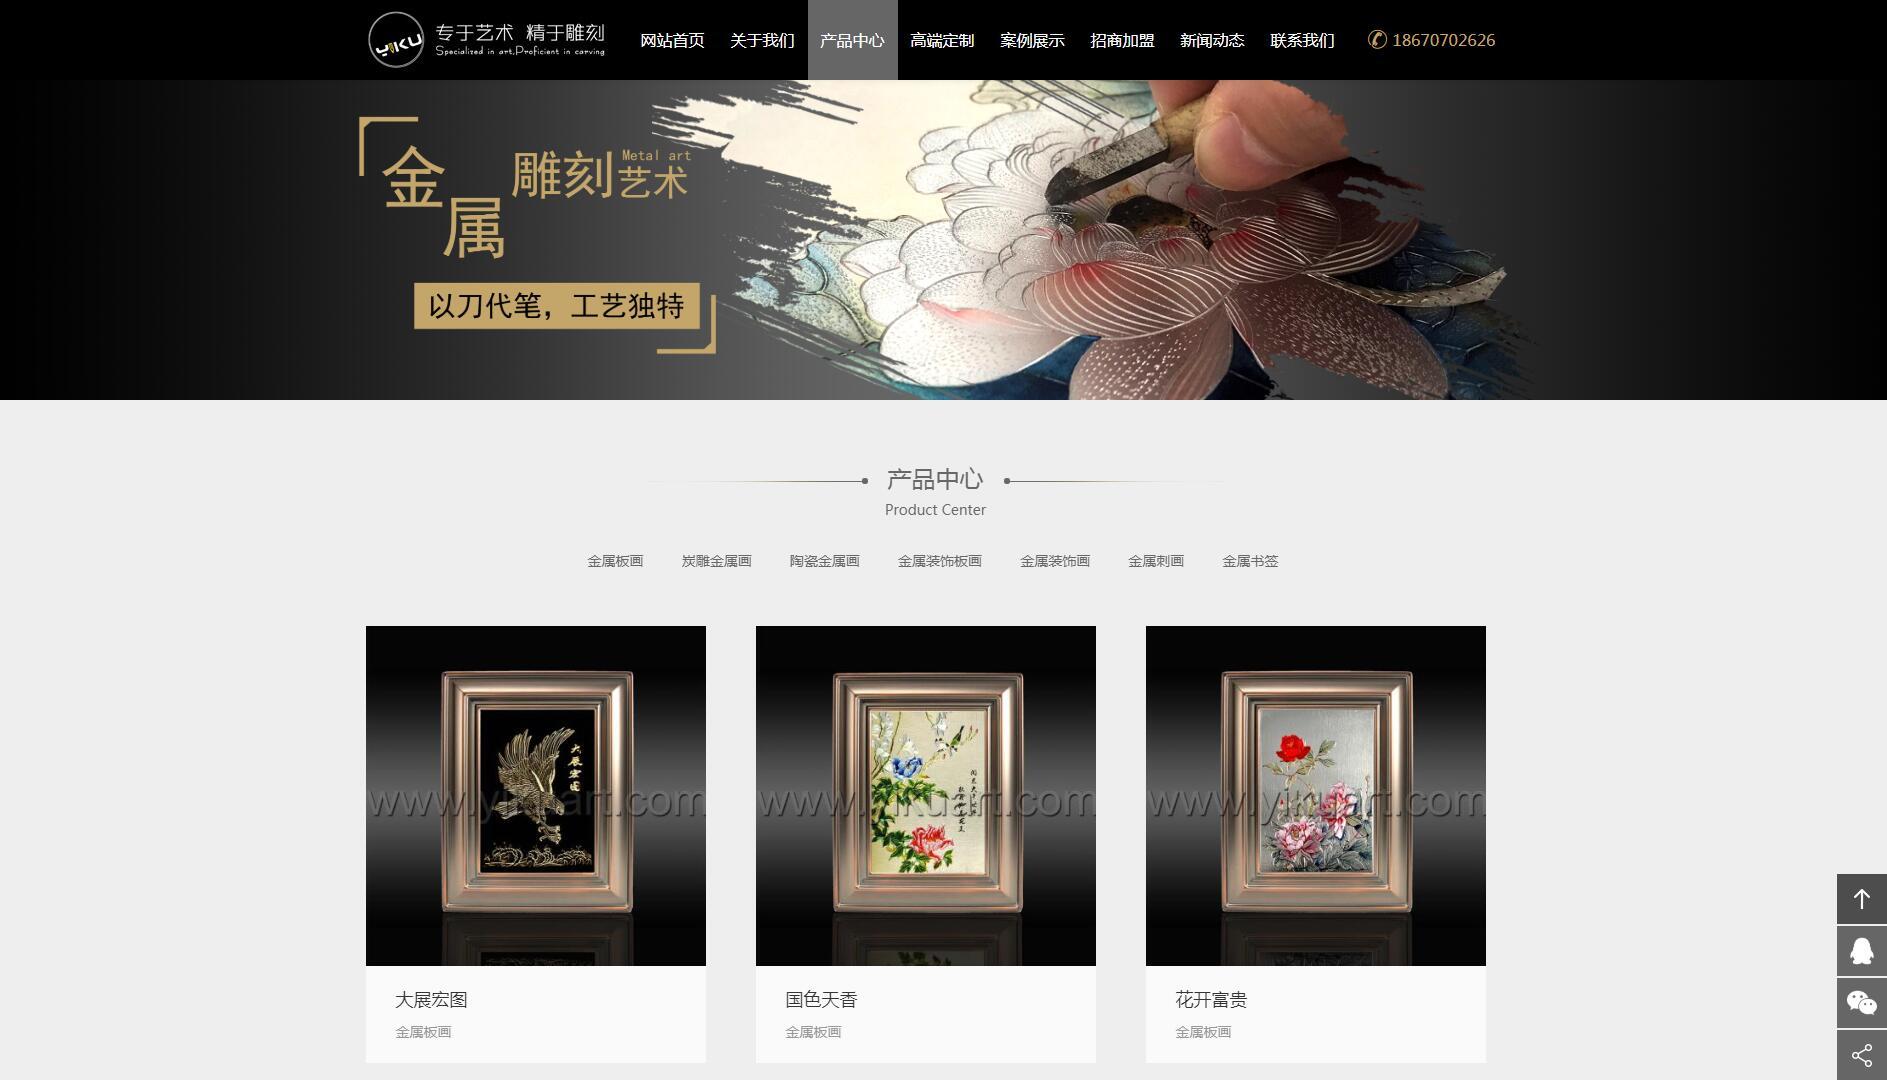 iBlackArtResponsive艺术装饰企业网站定制